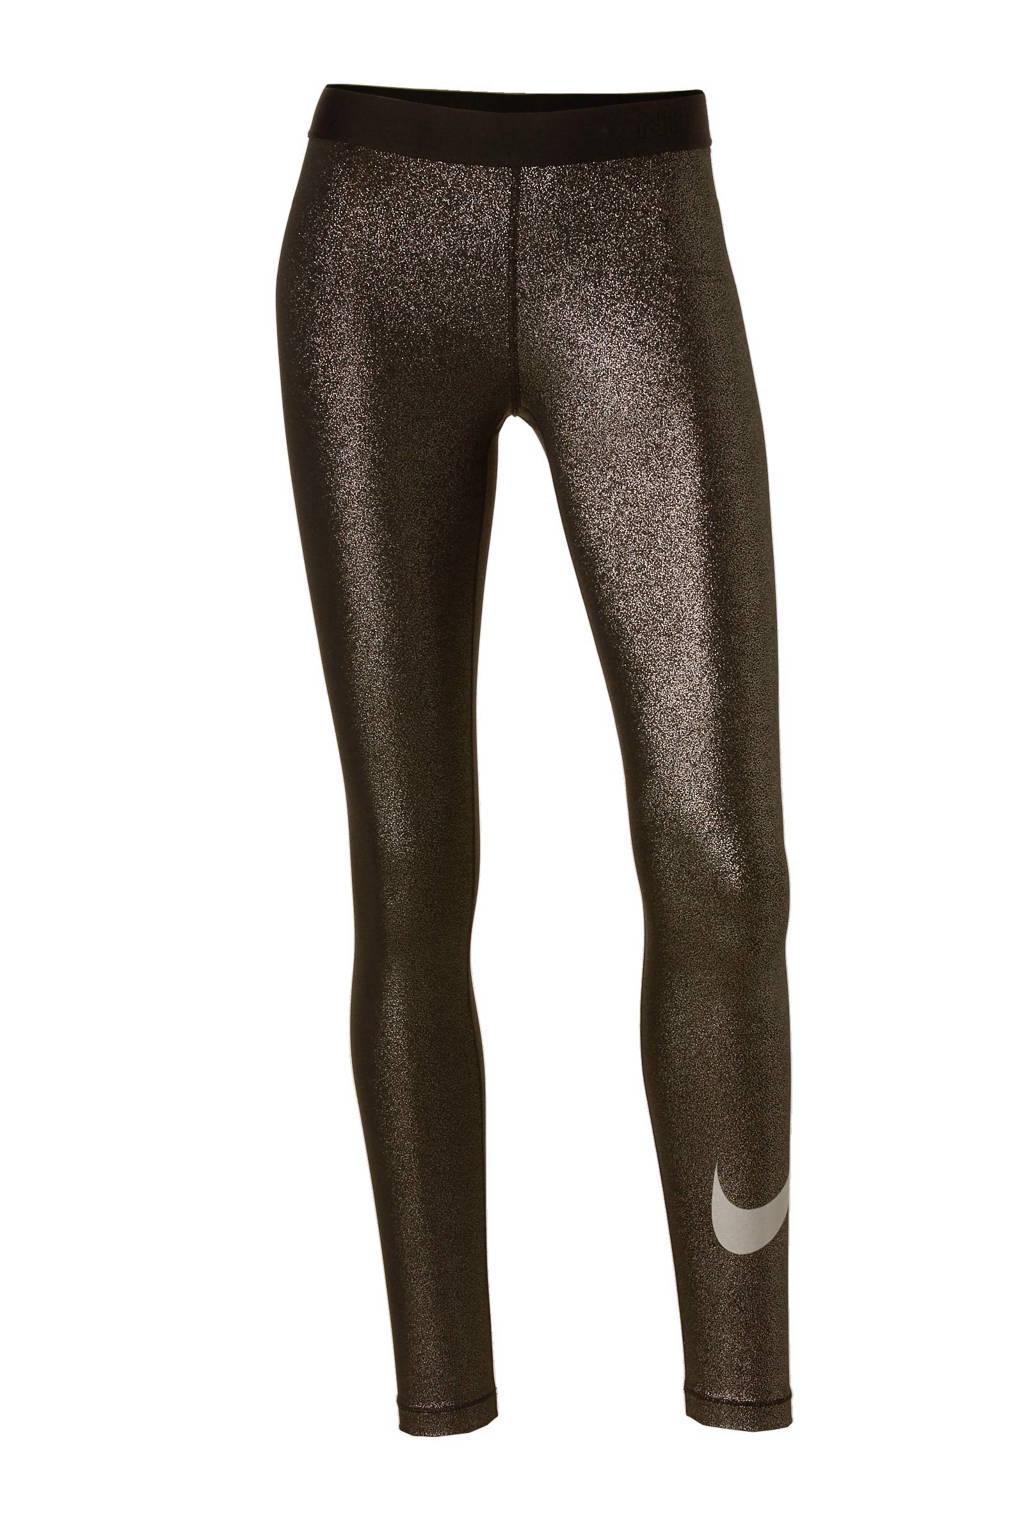 ef2c3edb968 Nike sportbroek, Zwart/zilver